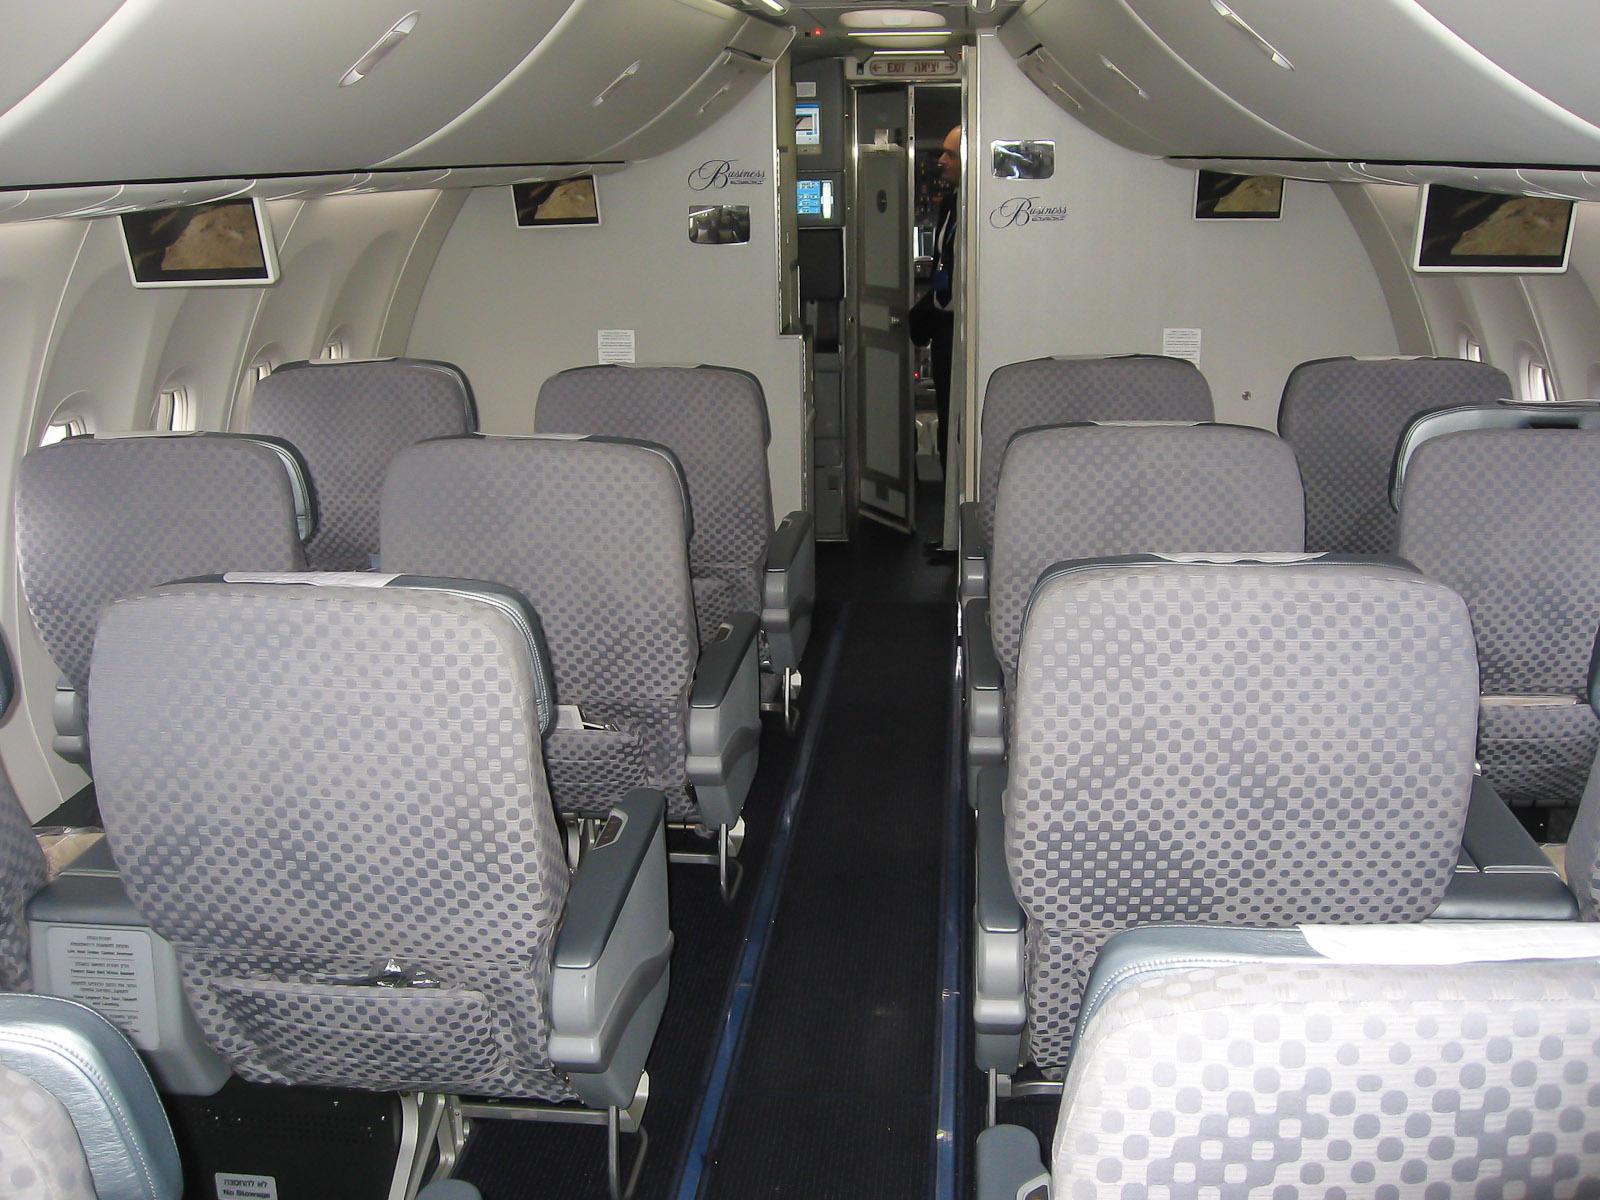 Салон бизнес-класса в самолете Боинг-737-900 авиакомпании Эль Аль